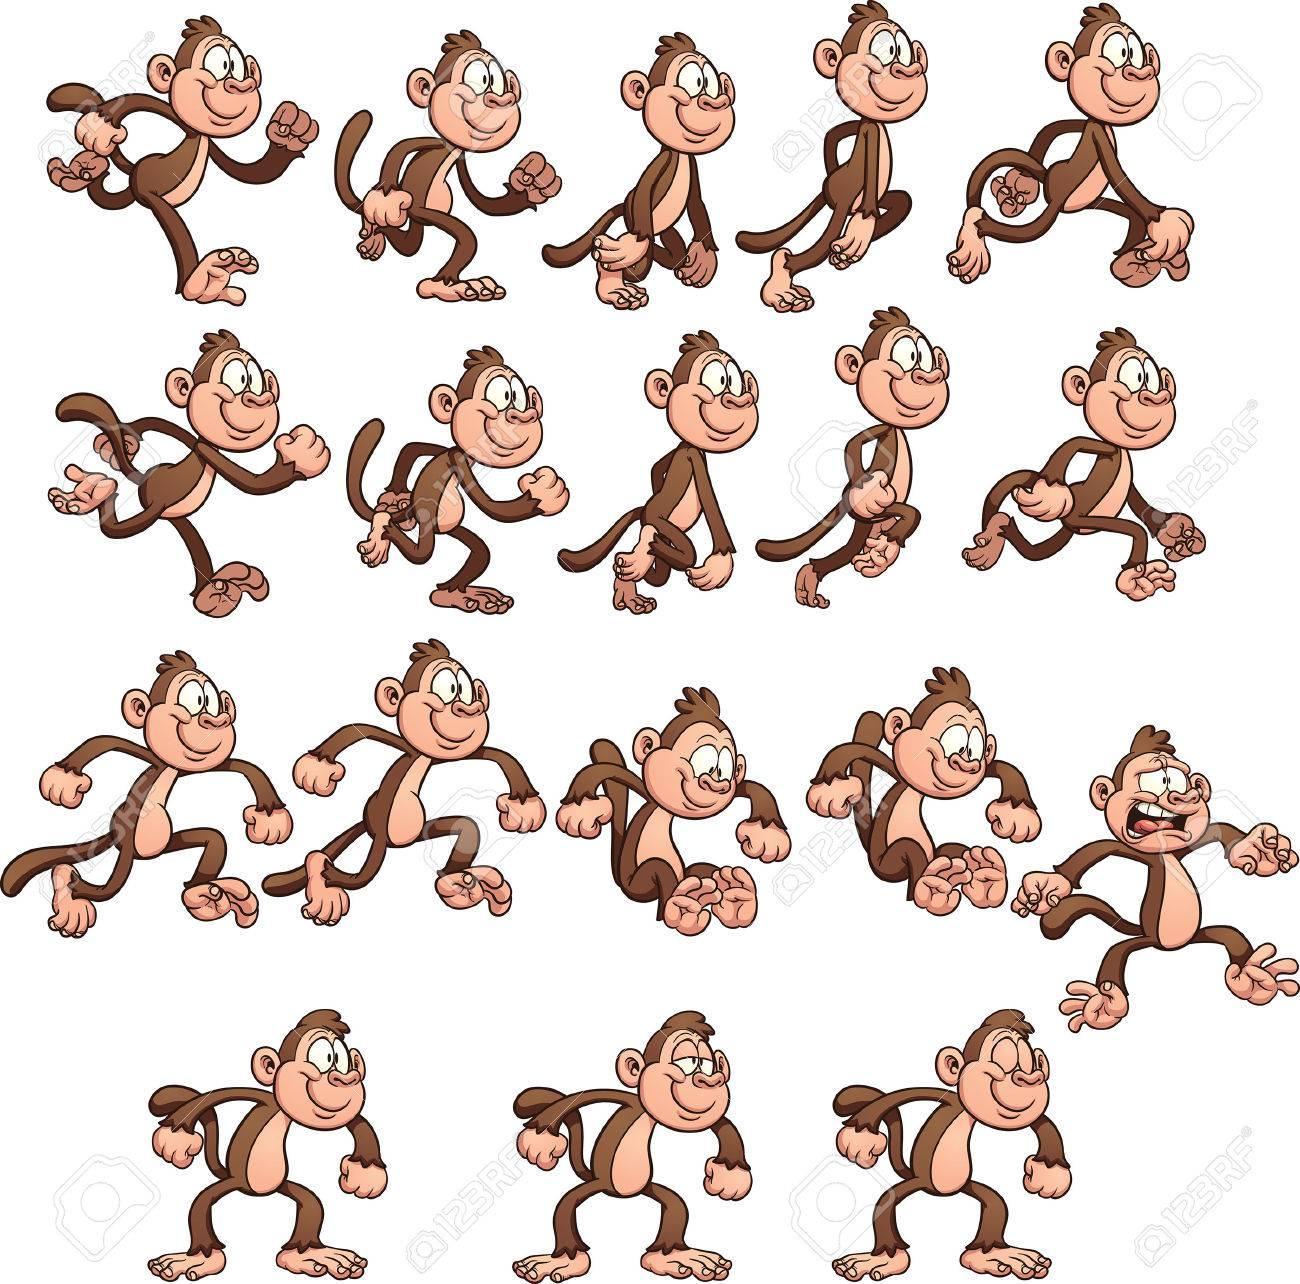 Cartoon monkey sprites  Vector clip art illustration with simple